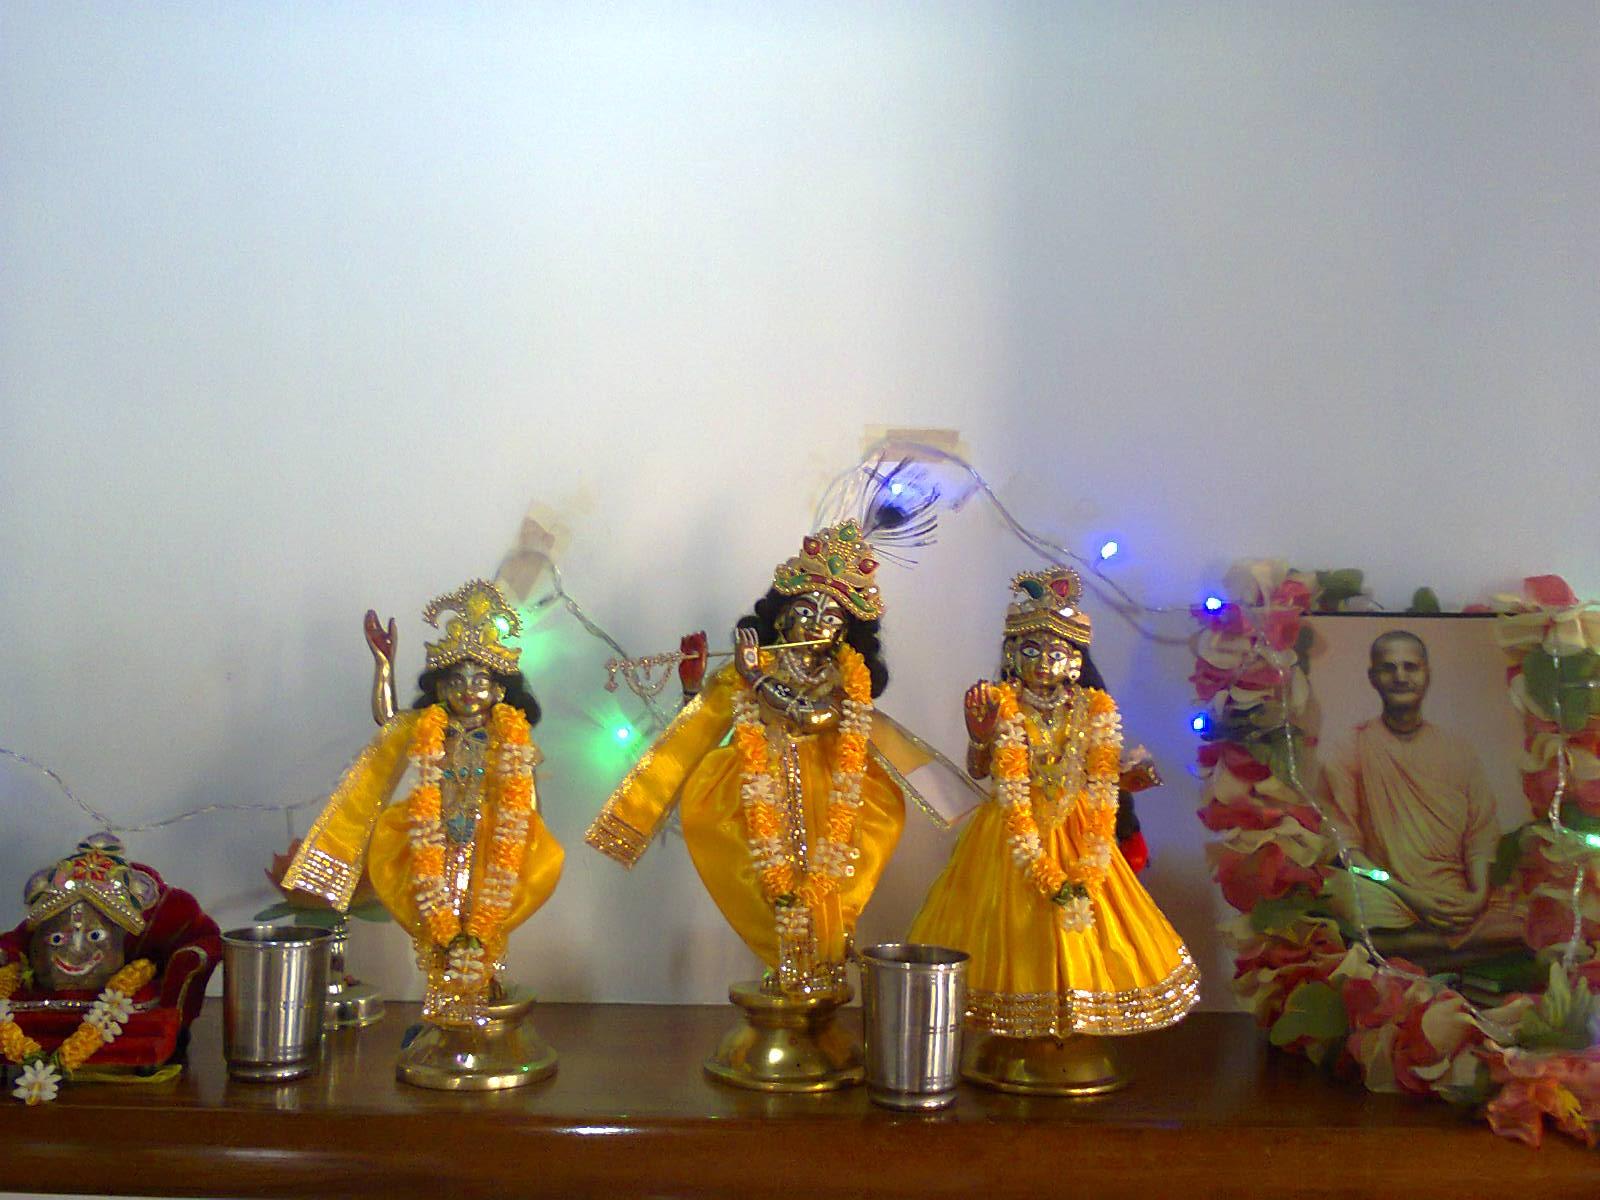 Sri Giri Raj Sri Goura Sri Sri Radha Govinda-dev - SKGM-B.H